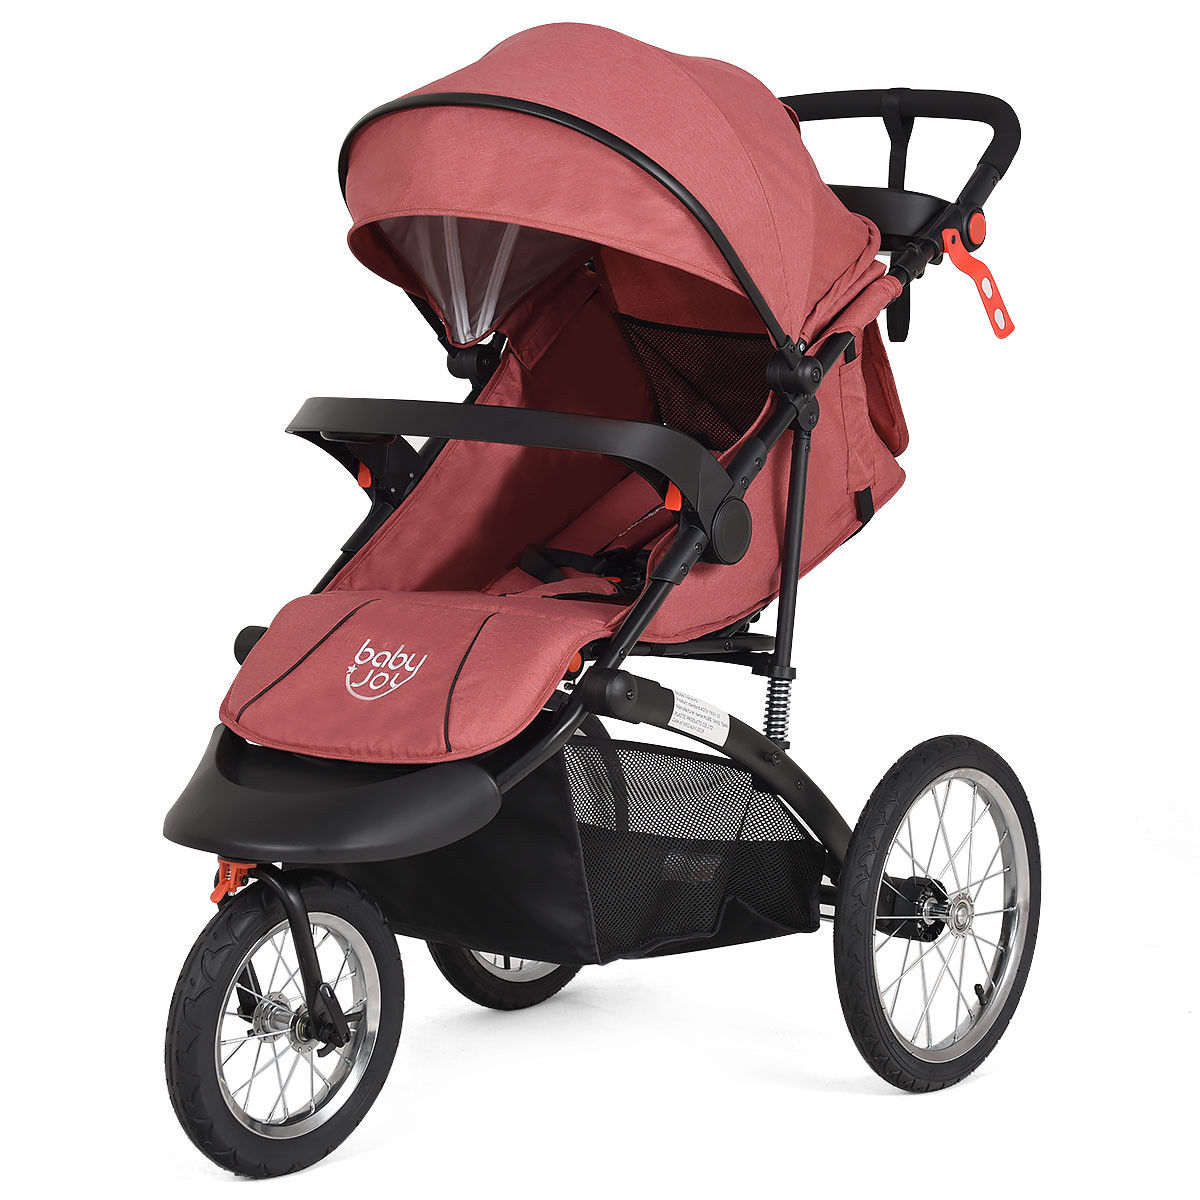 Baby-Joy Portable Folding Stroller Baby Jogger Kids Travel ...